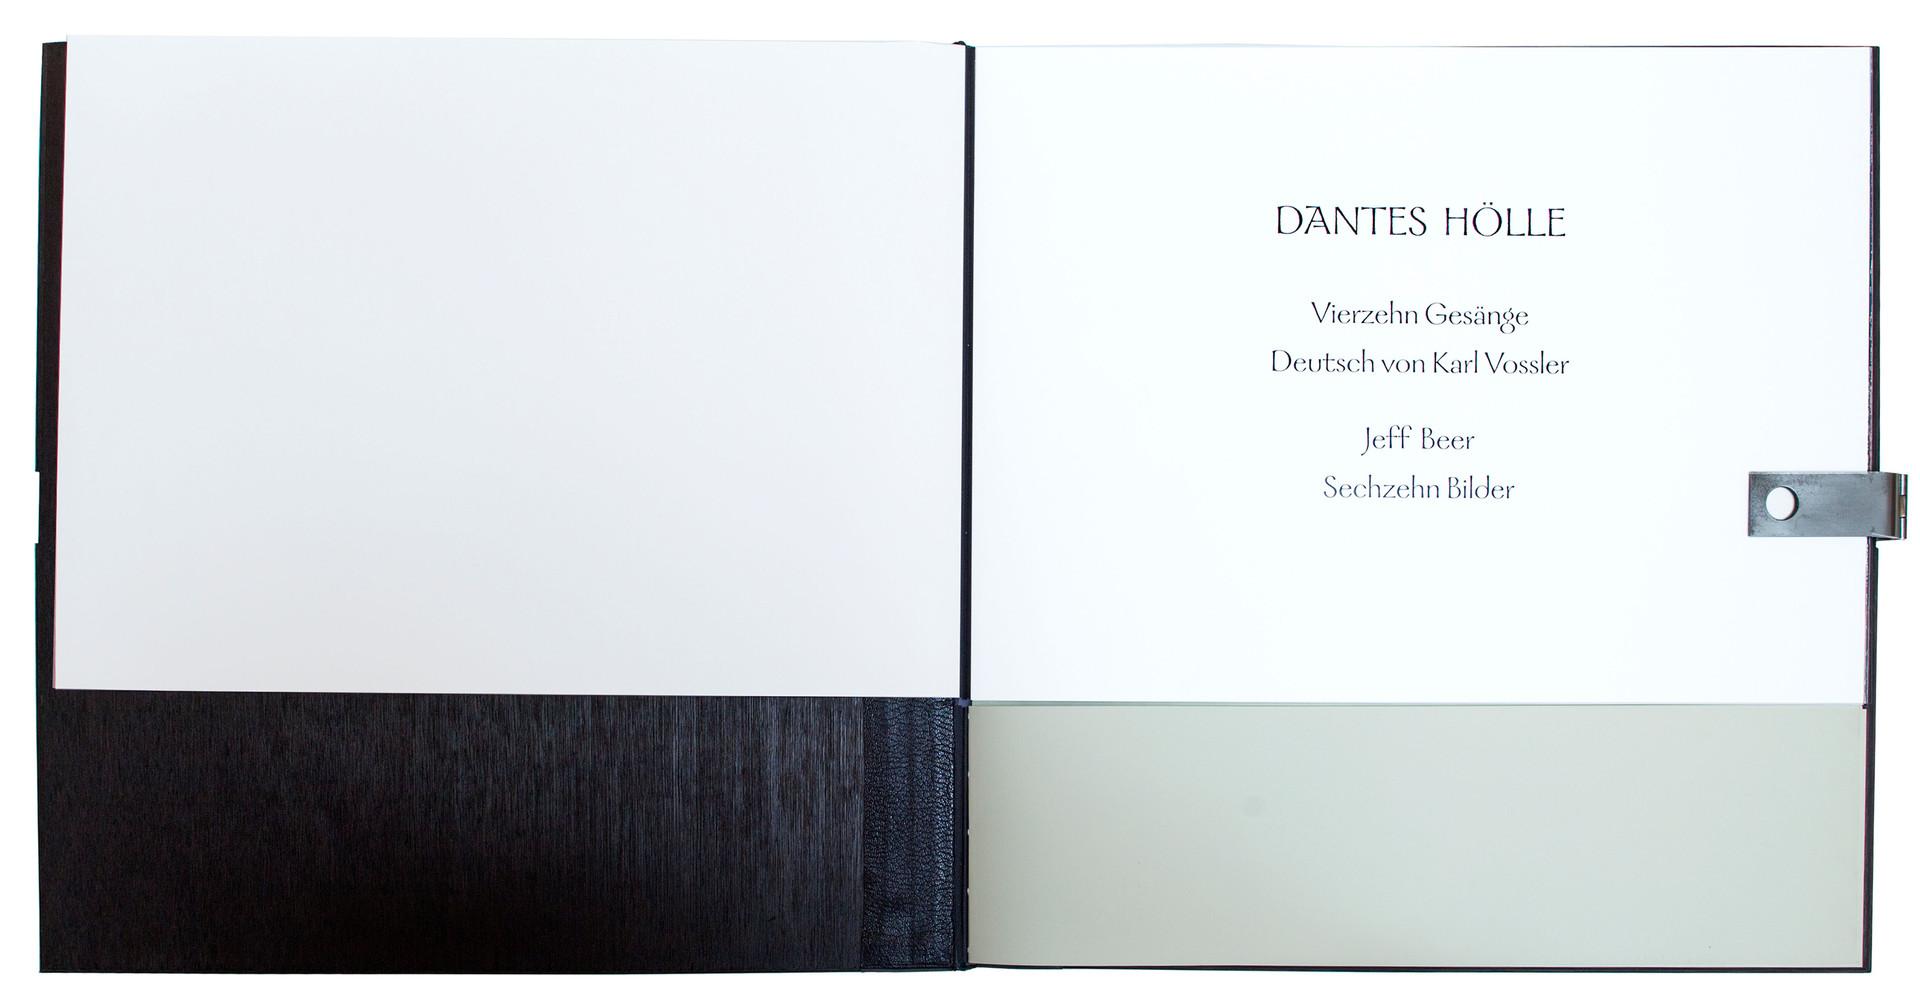 05_Dante.jpg